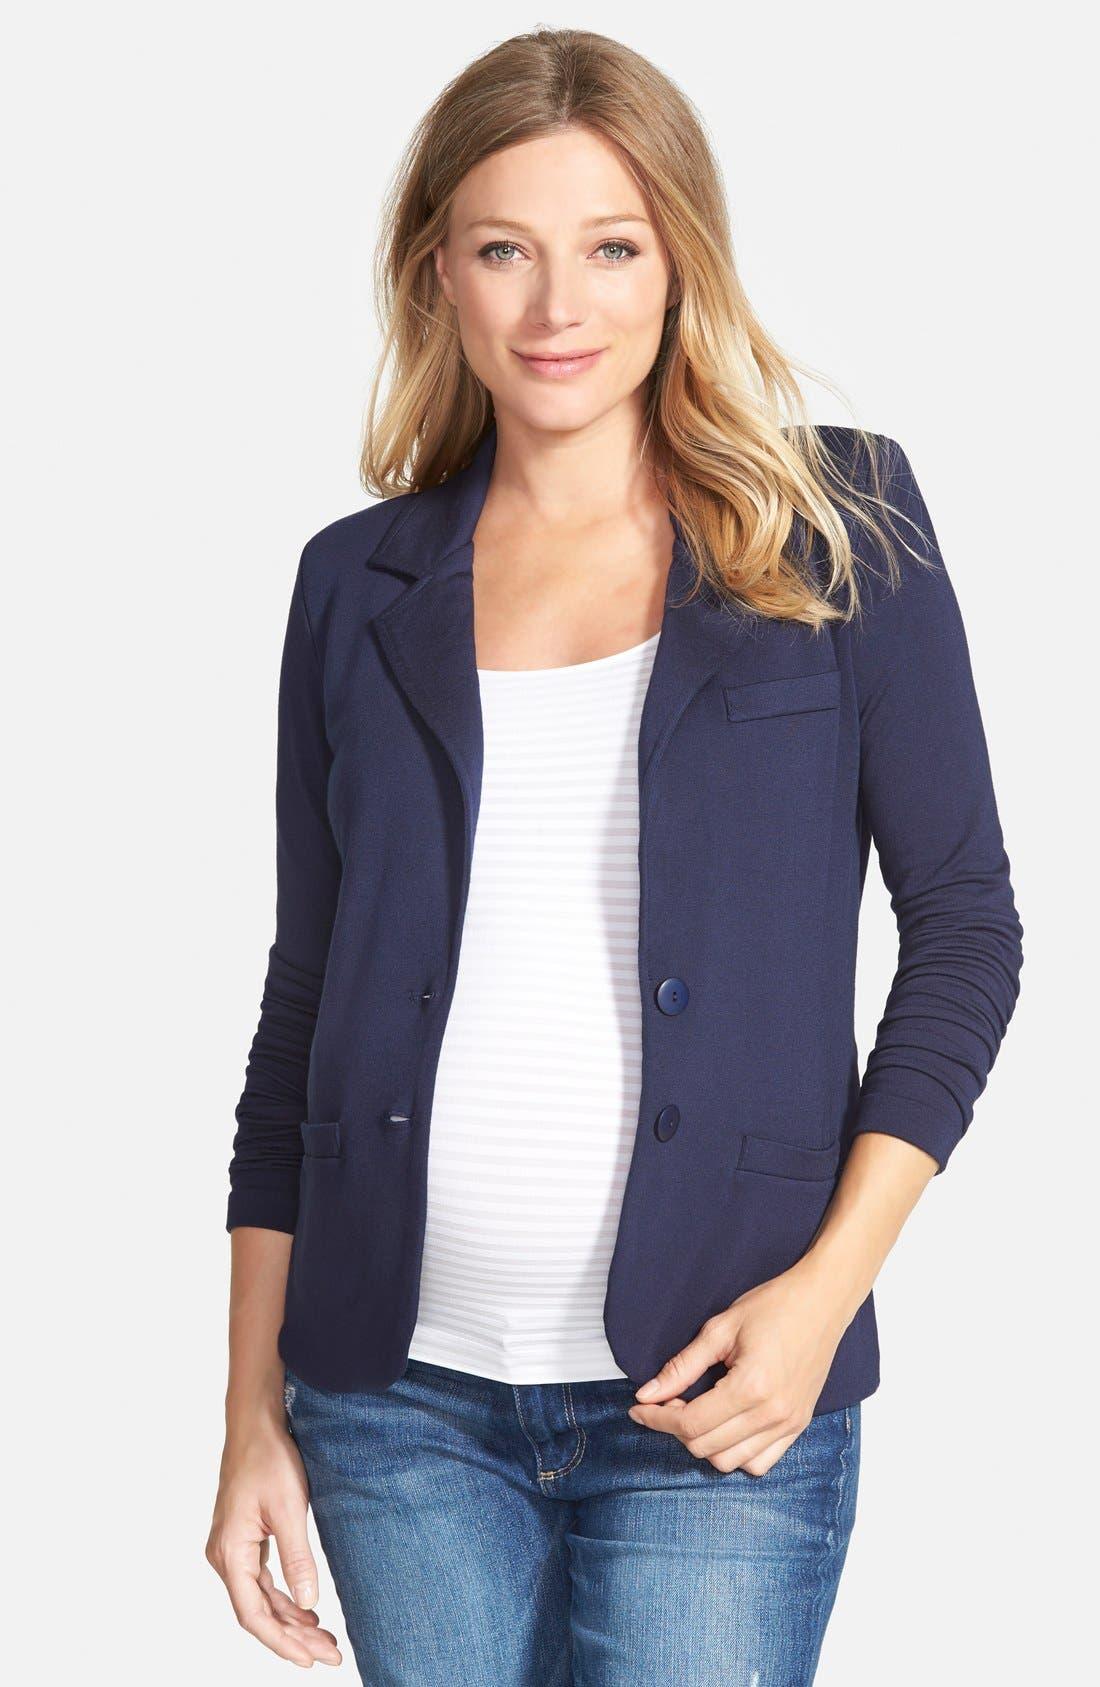 Alternate Image 1 Selected - Tart Maternity 'Essential' Maternity Blazer